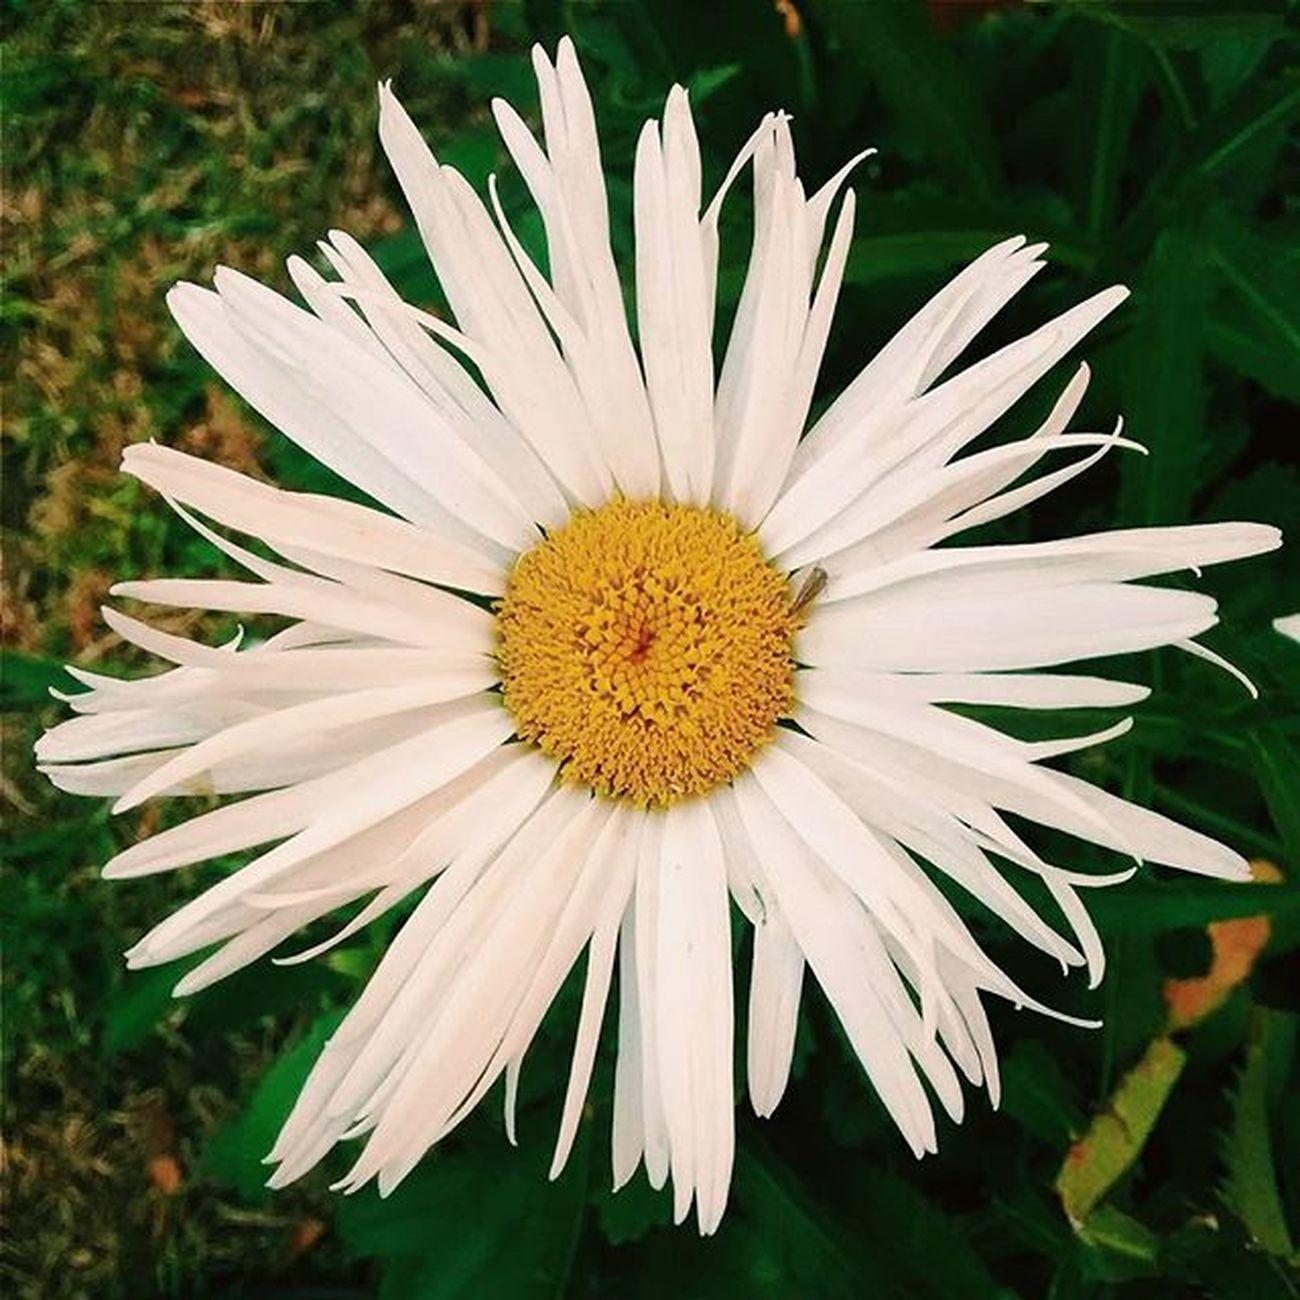 Flowers Flowerstagram Flower Love Nature Naturelovers Petals Texture Instagood Instamoment Black Daisyflower Margarita Like Loveit Helovesme Photooftheday Color Followme Like4like Likeforlike Instalove Vscocam Likeit F4F